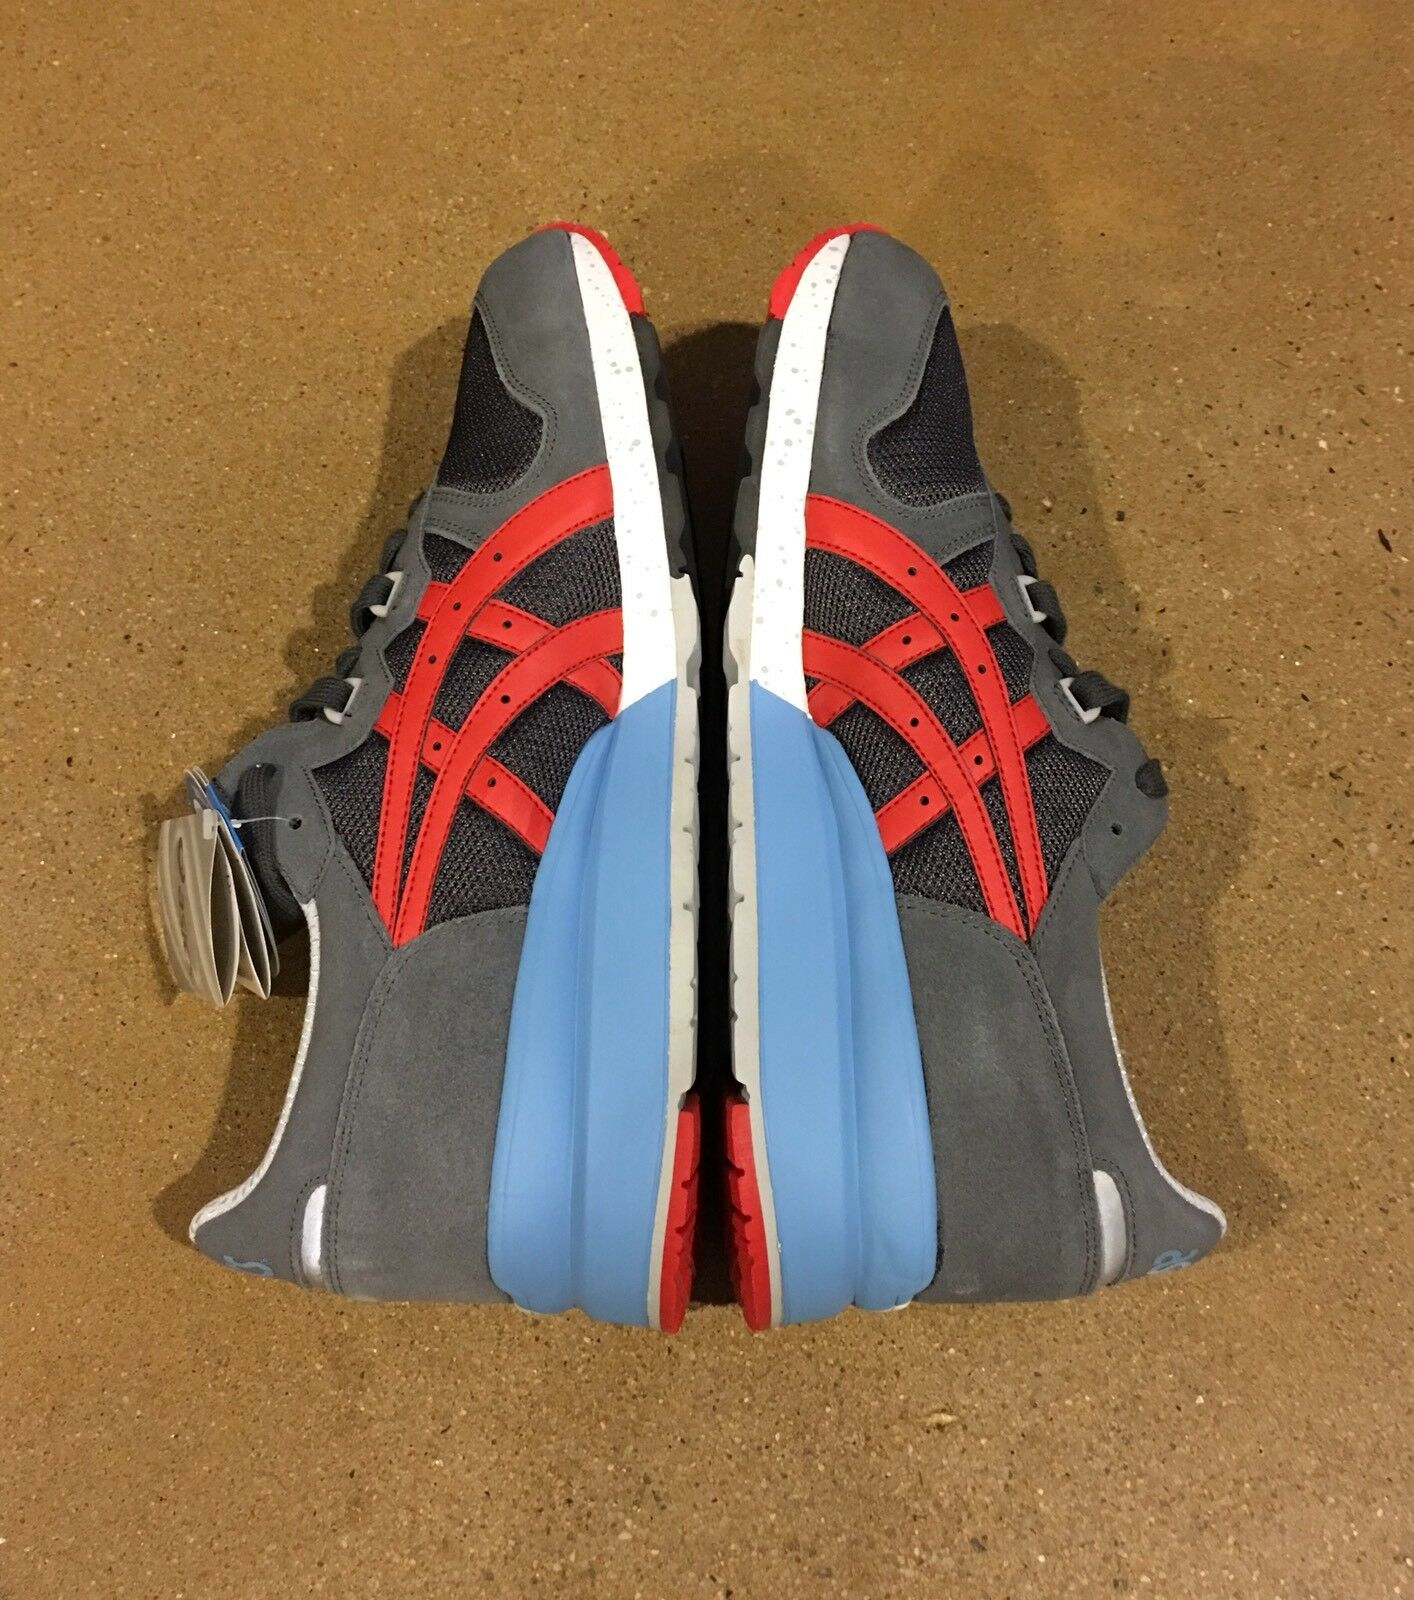 Asics Gel Epirus Size 12.5 US Men's Dark Grey Fiery Red Running Shoes Sneakers